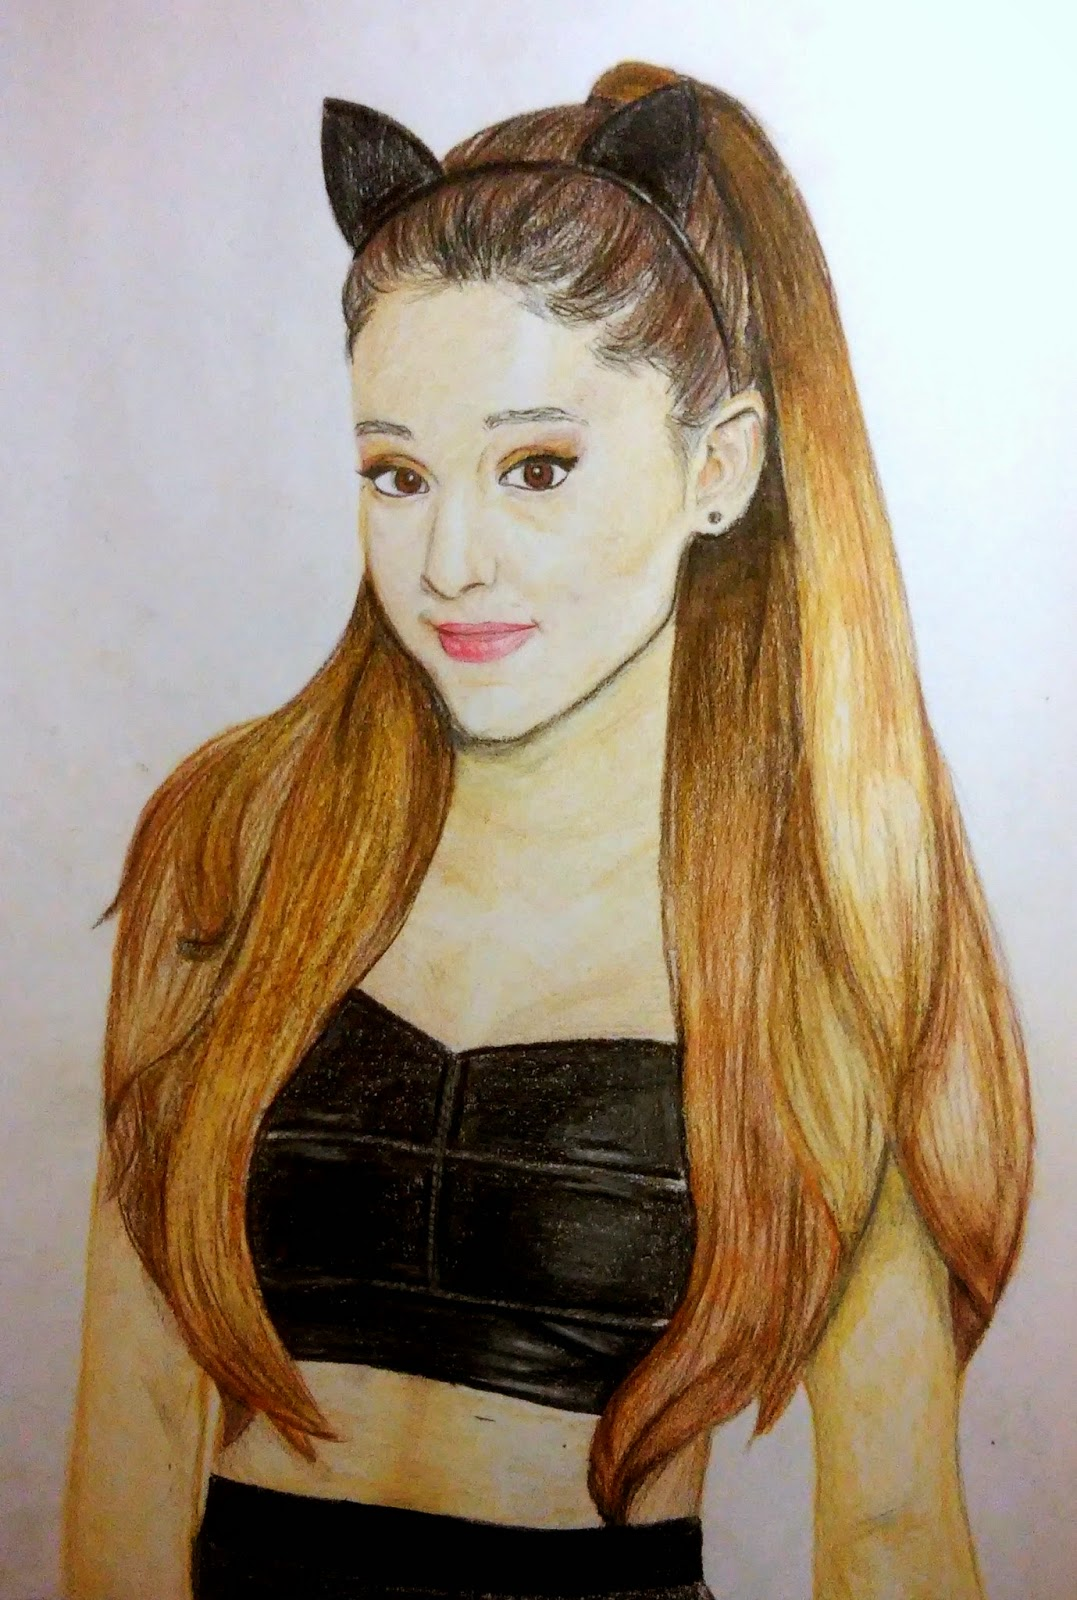 Klaudia Lechowska Rysunek Ariana Grande Portret W Kolorze